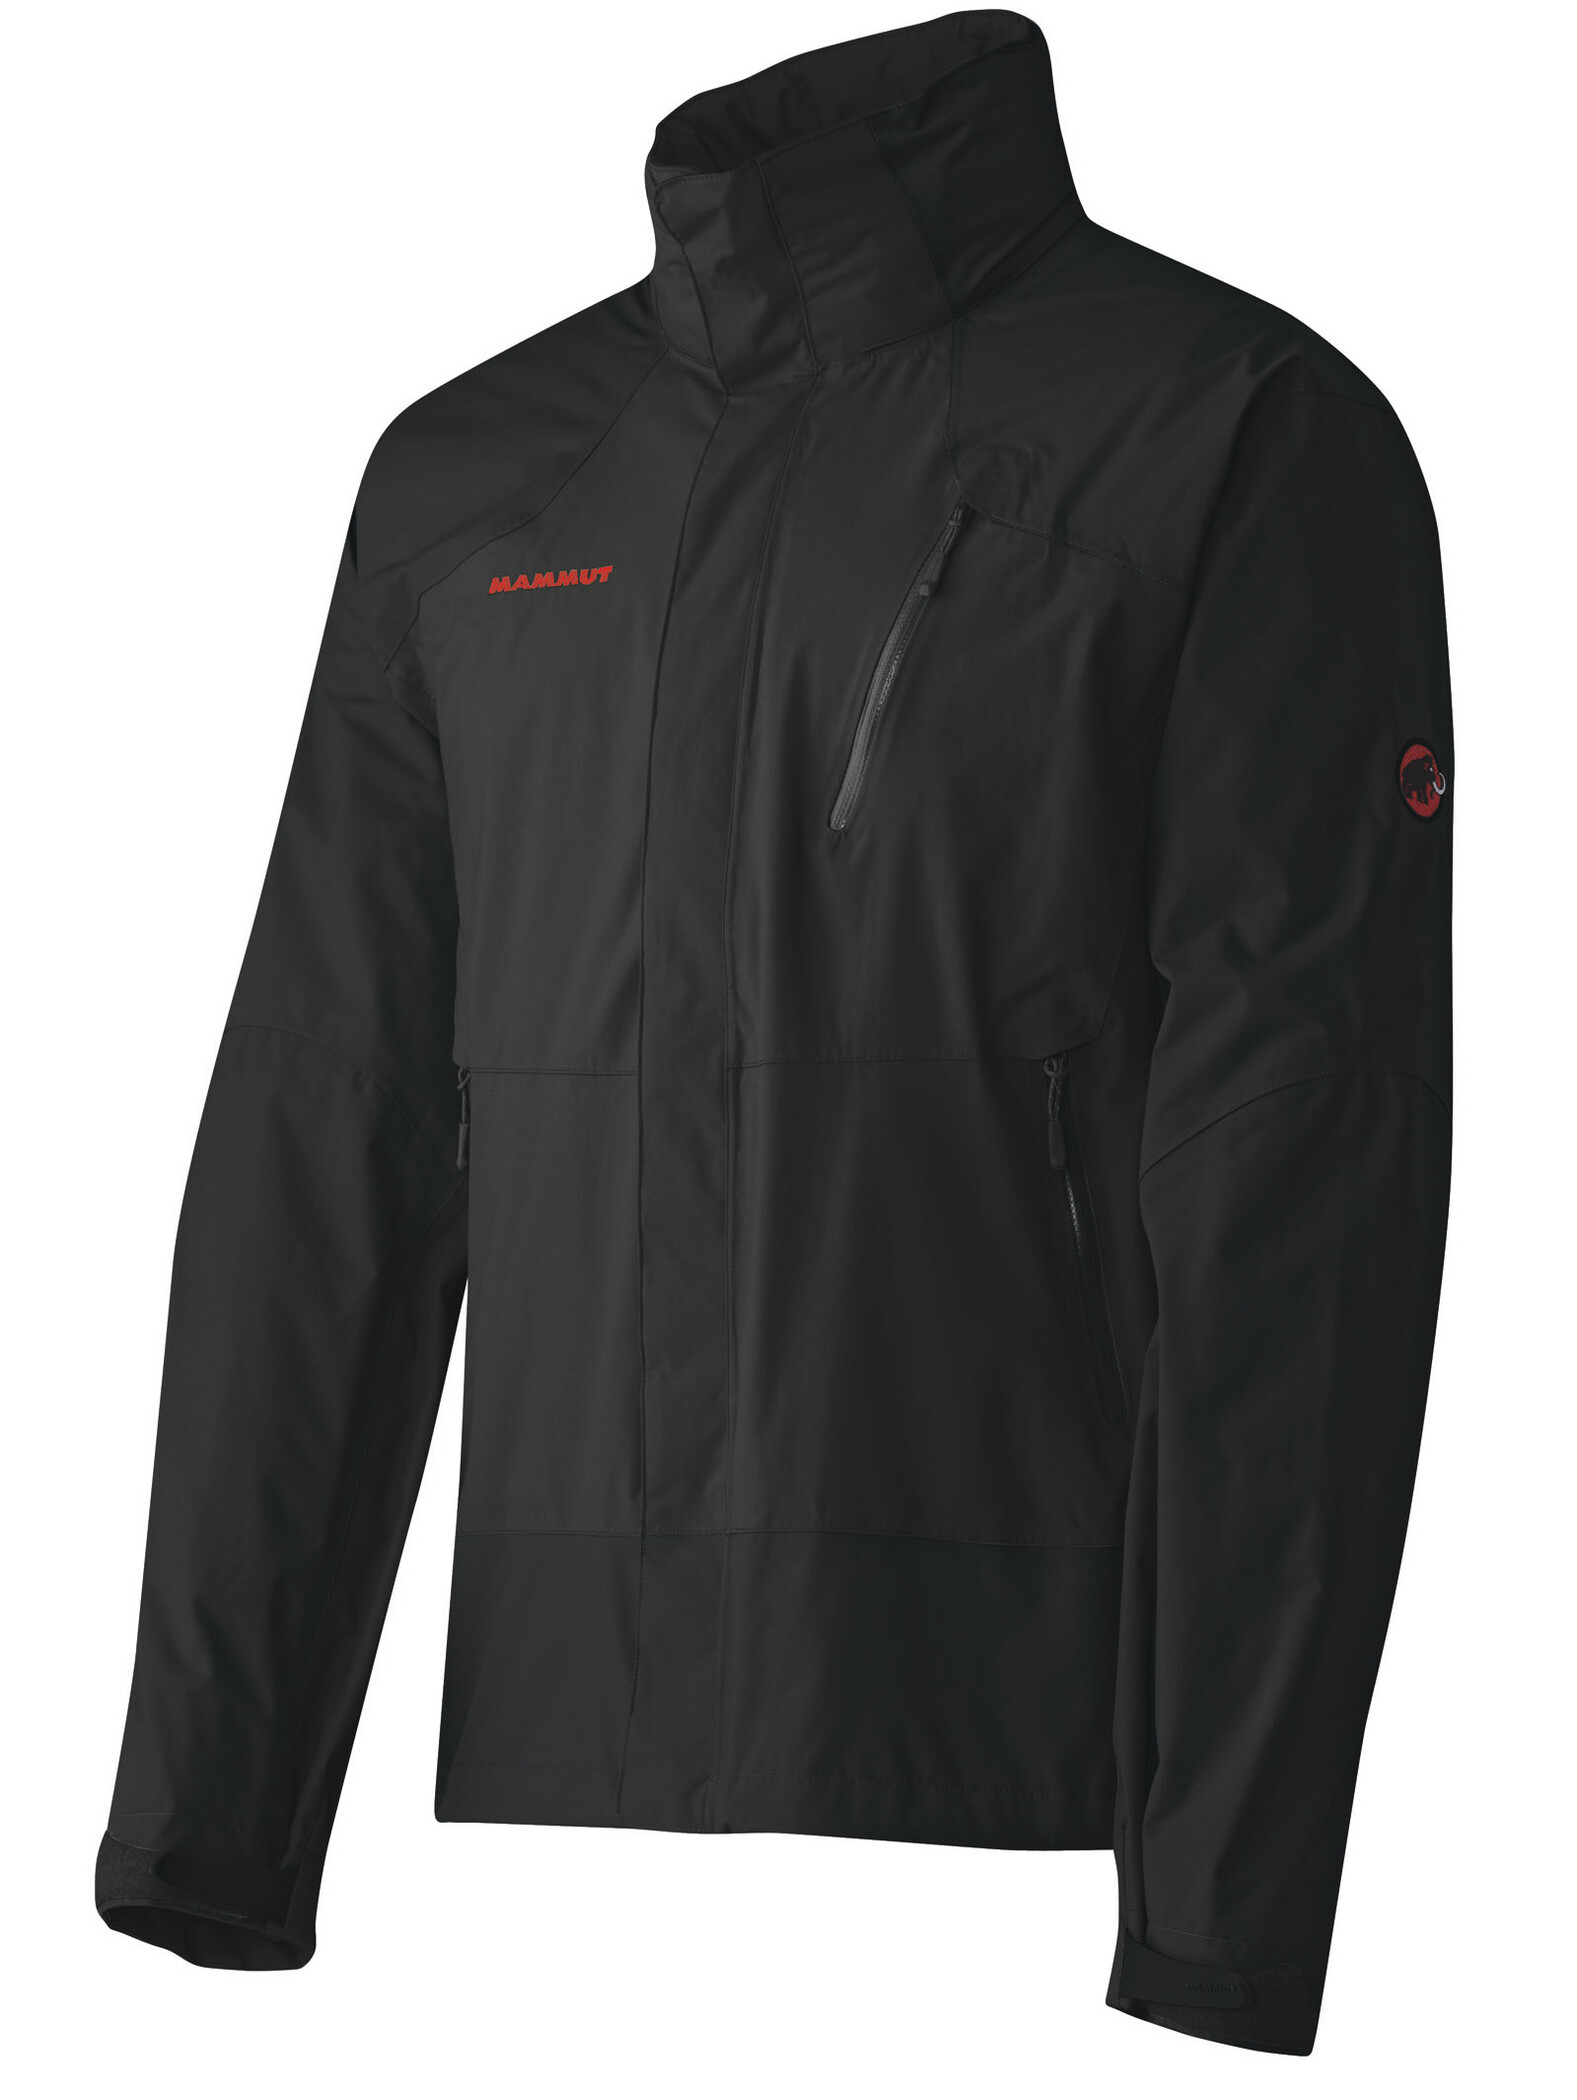 Mammut Kinabalu Jacket Men black M jacke~oberteil~Bekleidung~Outdoor~outdoorjacke~outdoorbekleidung~hardshelljacke~hardshell jacke